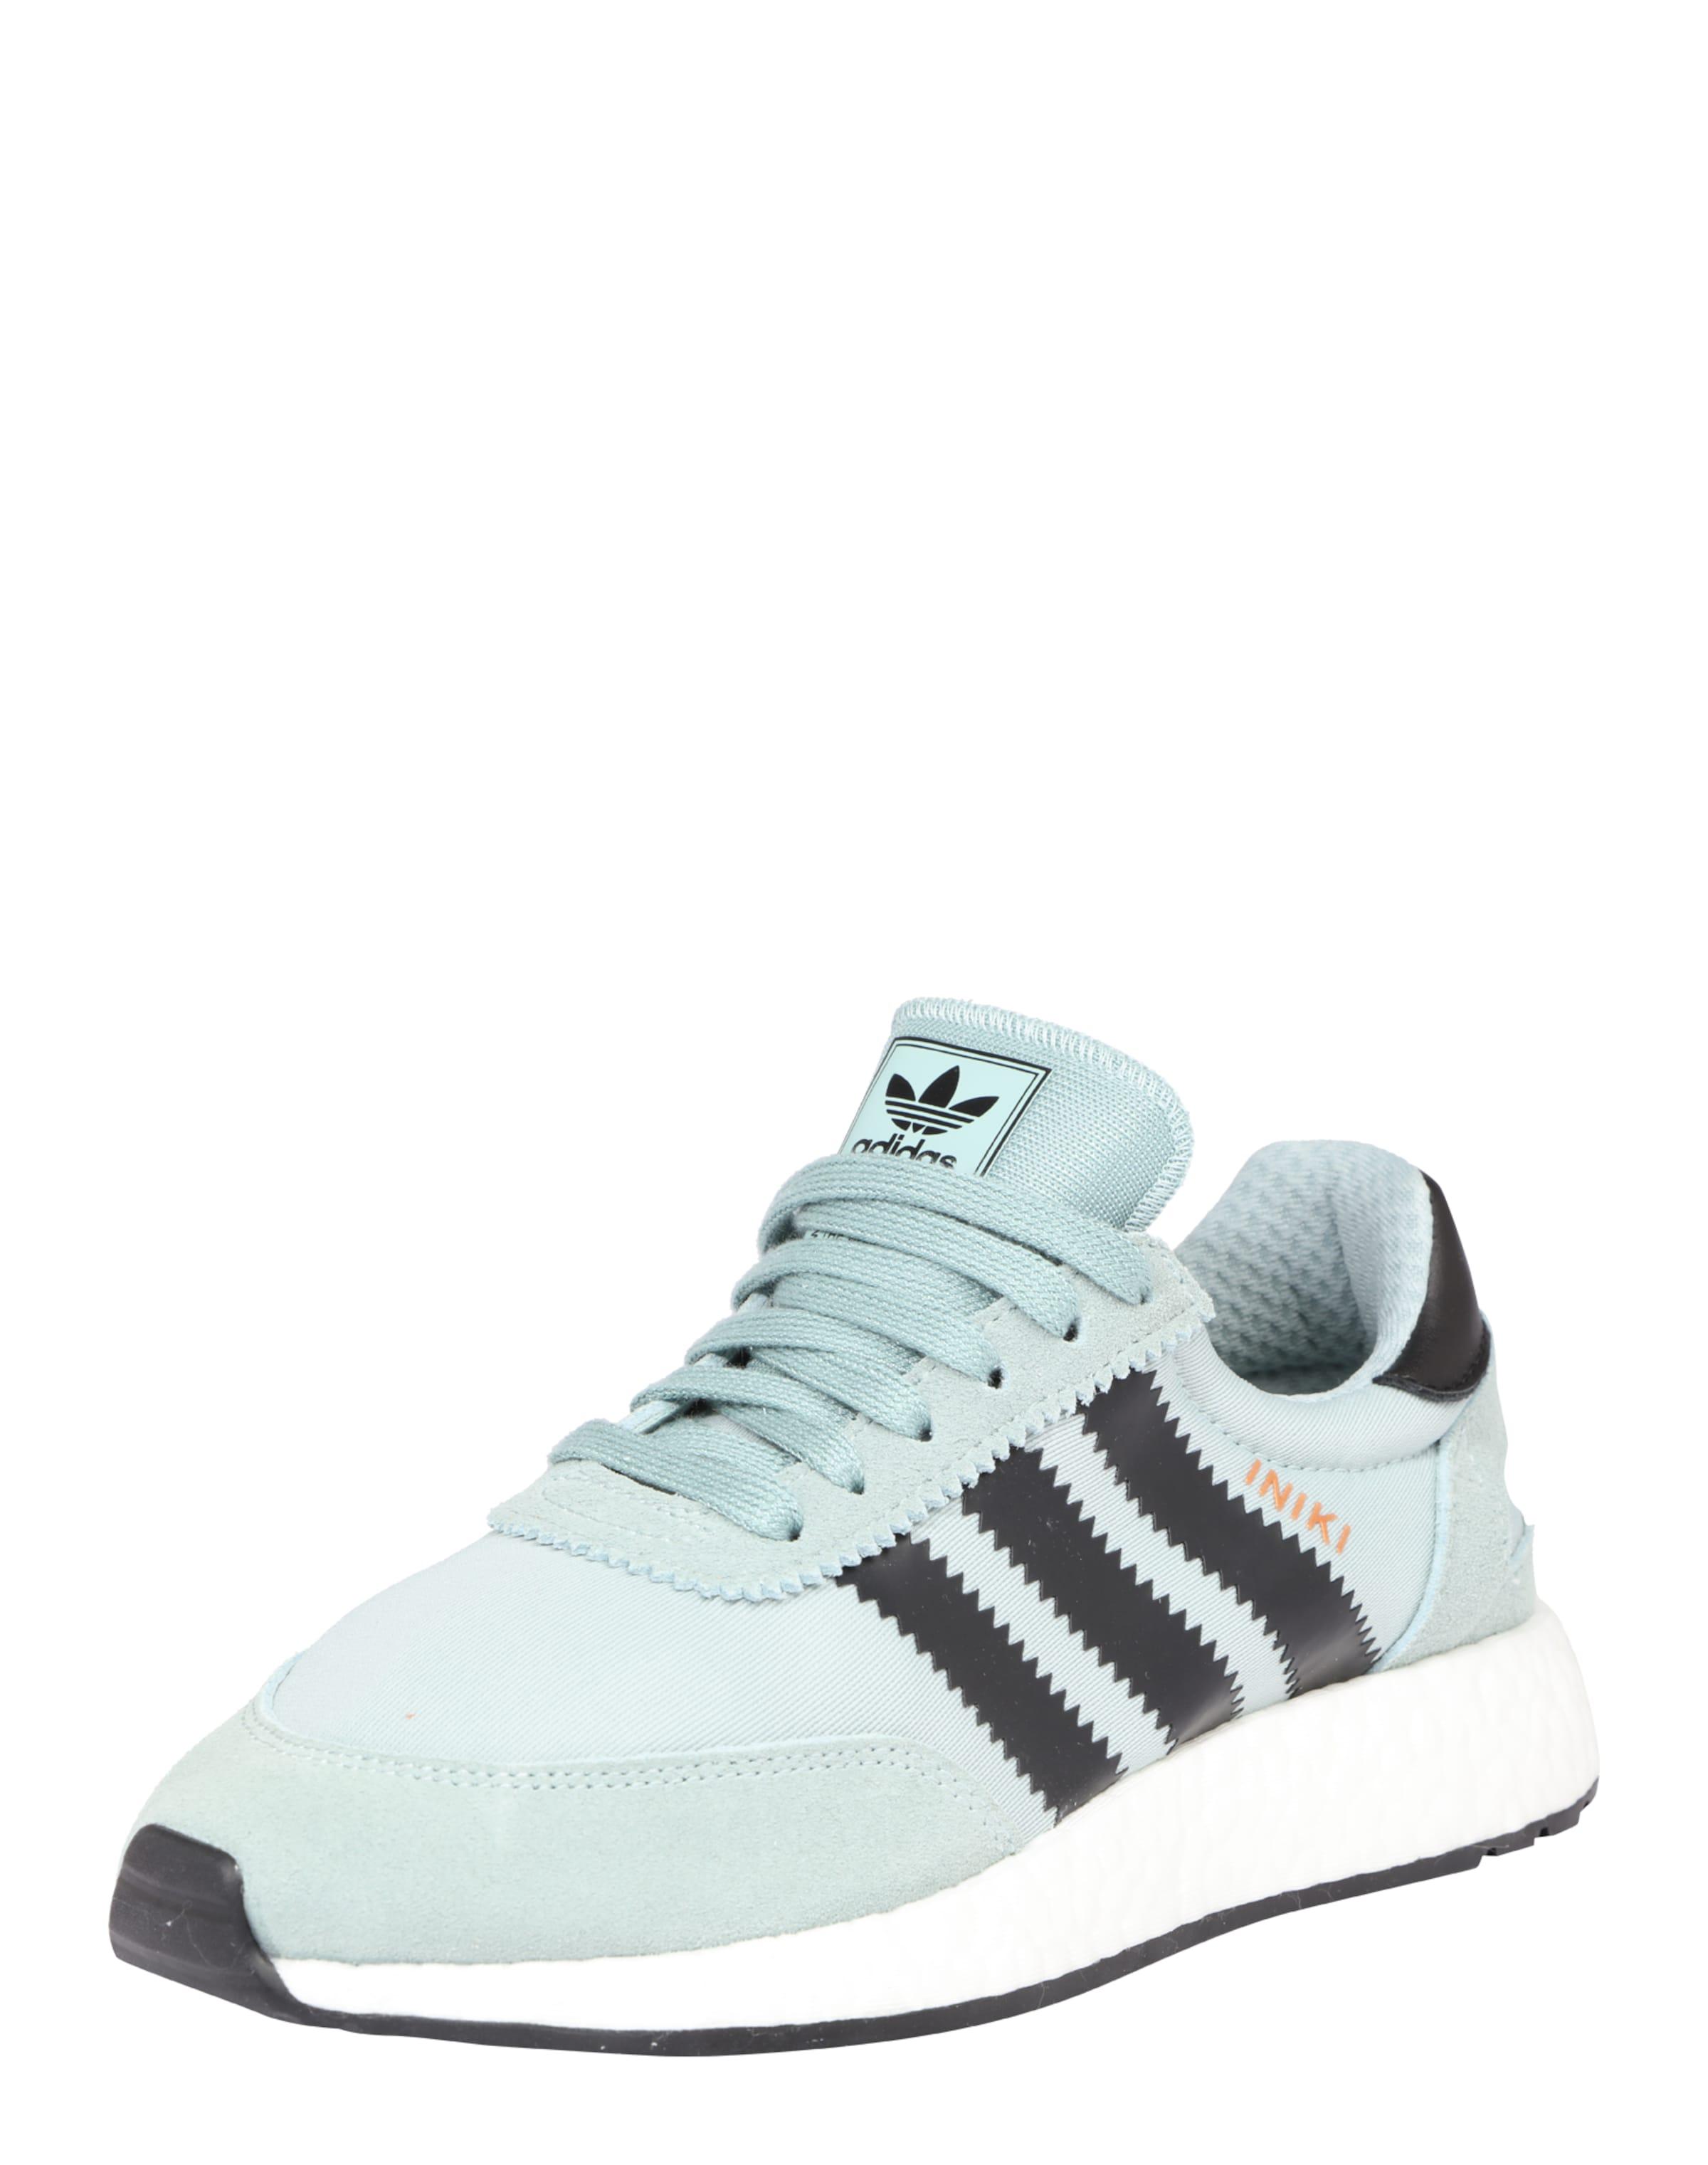 Haltbare Mode billige Schuhe ADIDAS ORIGINALS | Sneakers 'Iniki' Schuhe Gut getragene Schuhe